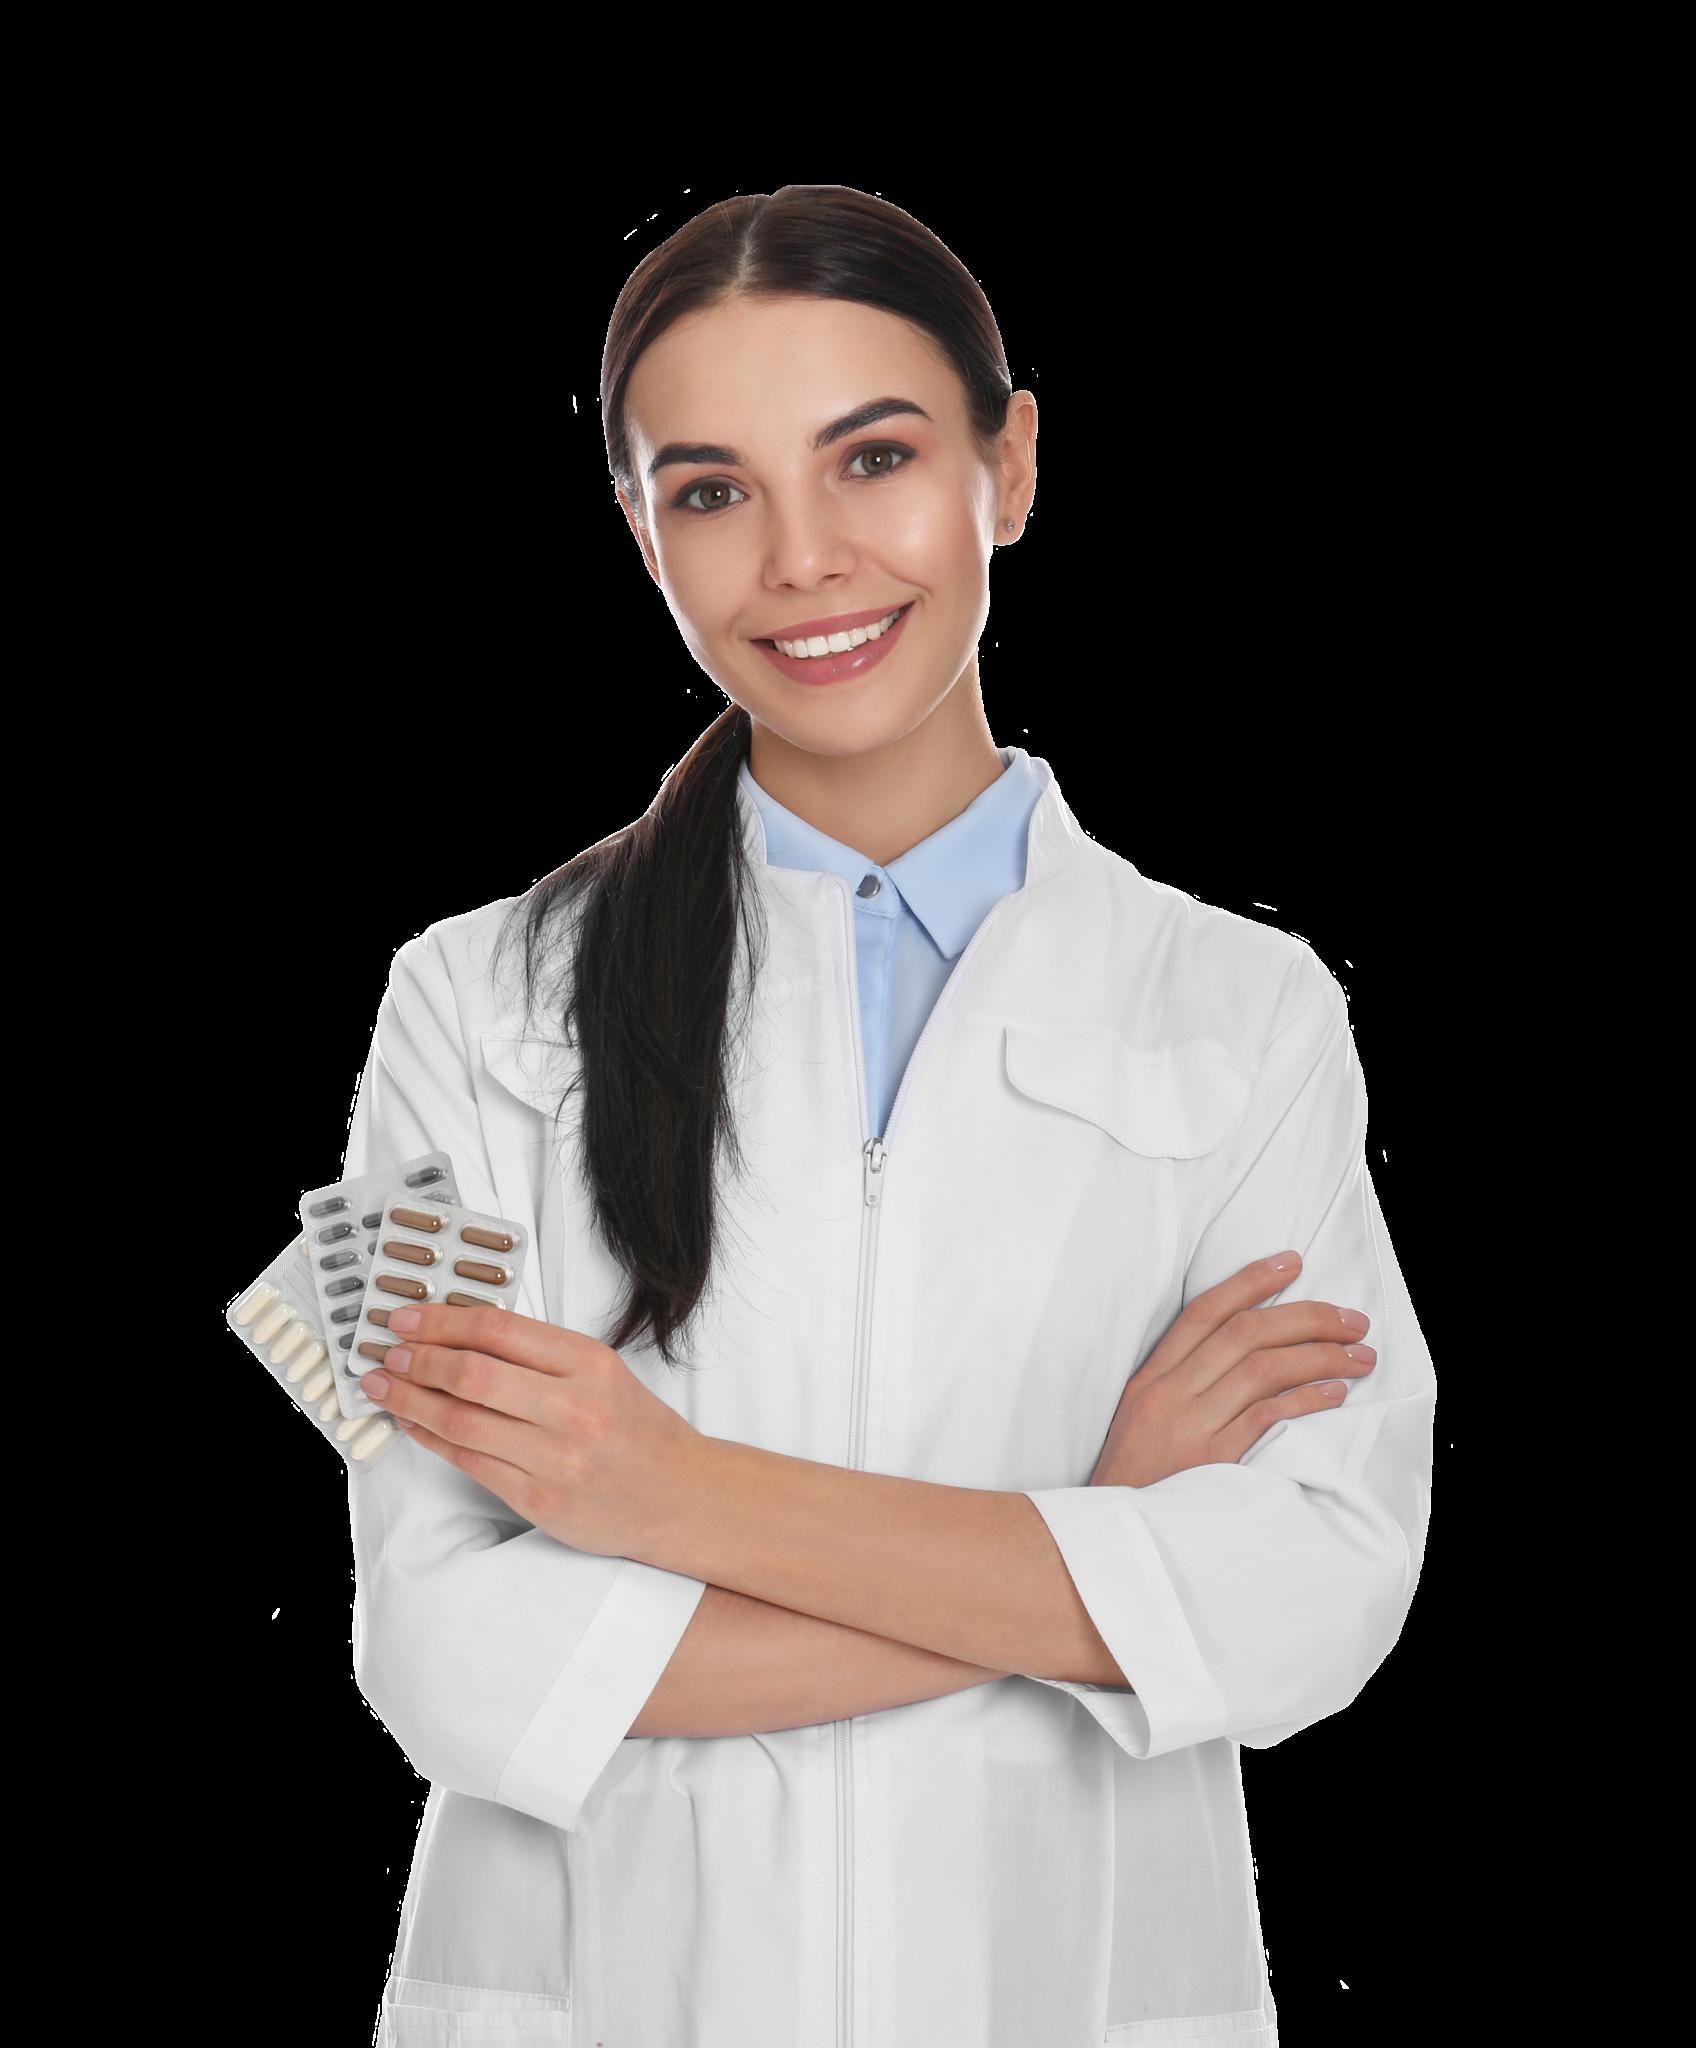 pharmacist img